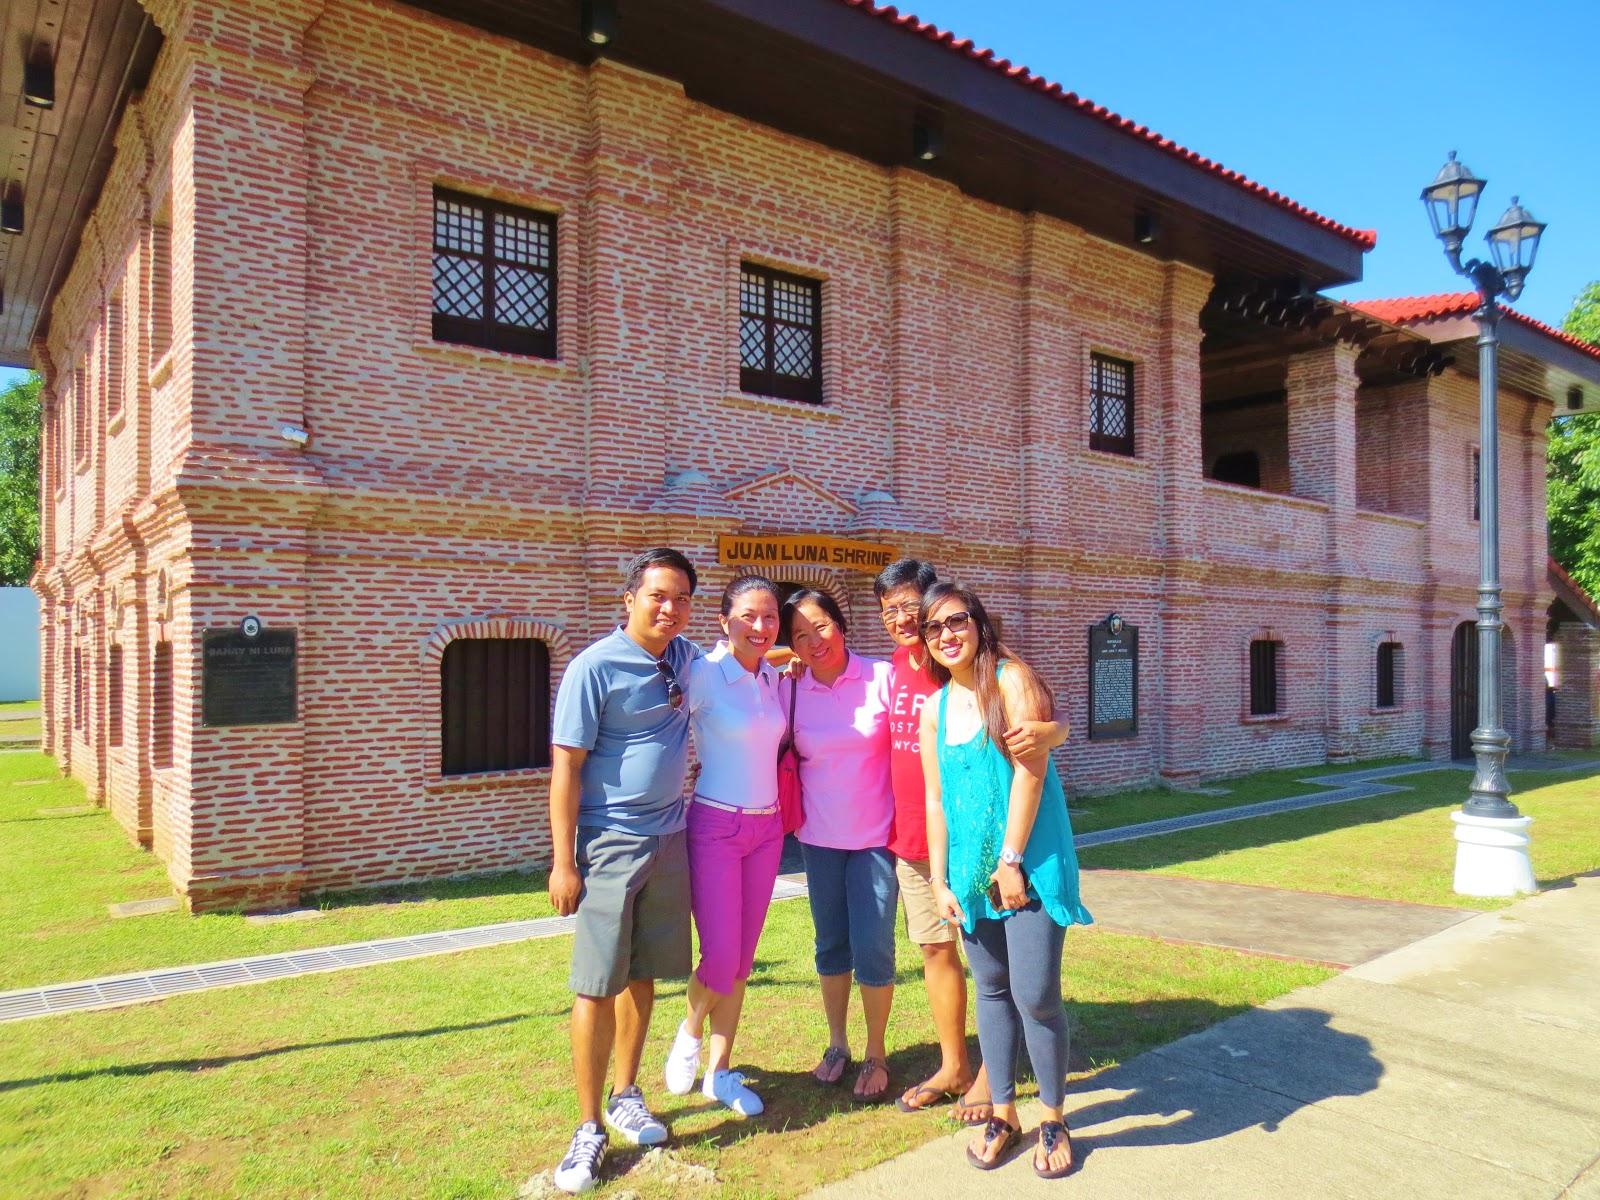 Juan Luna Shrine, Badoc, Ilocos Norte